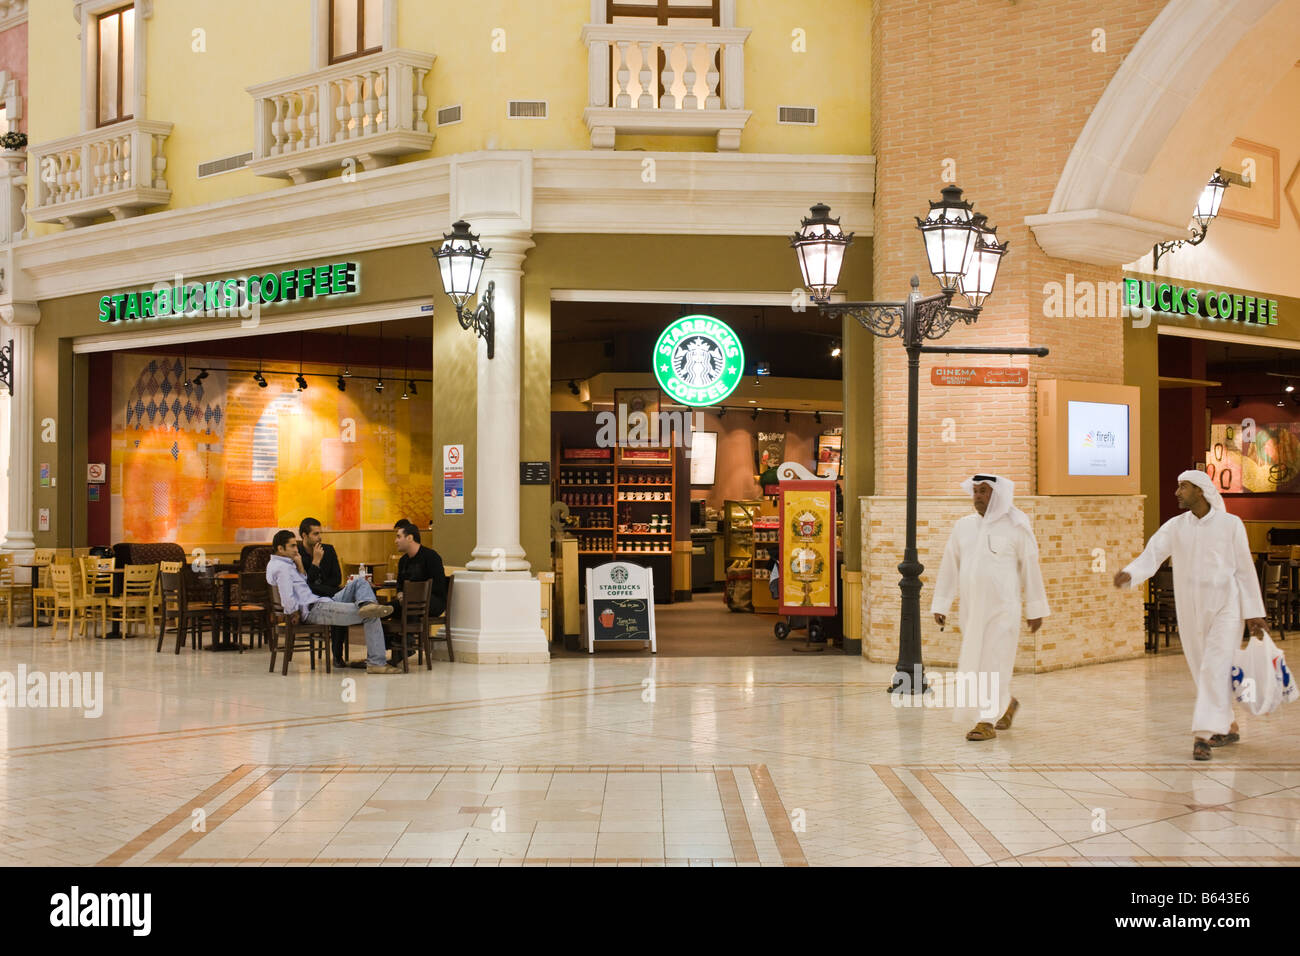 Starbucks, Villagio Mall, Doha, Qatar Immagini Stock